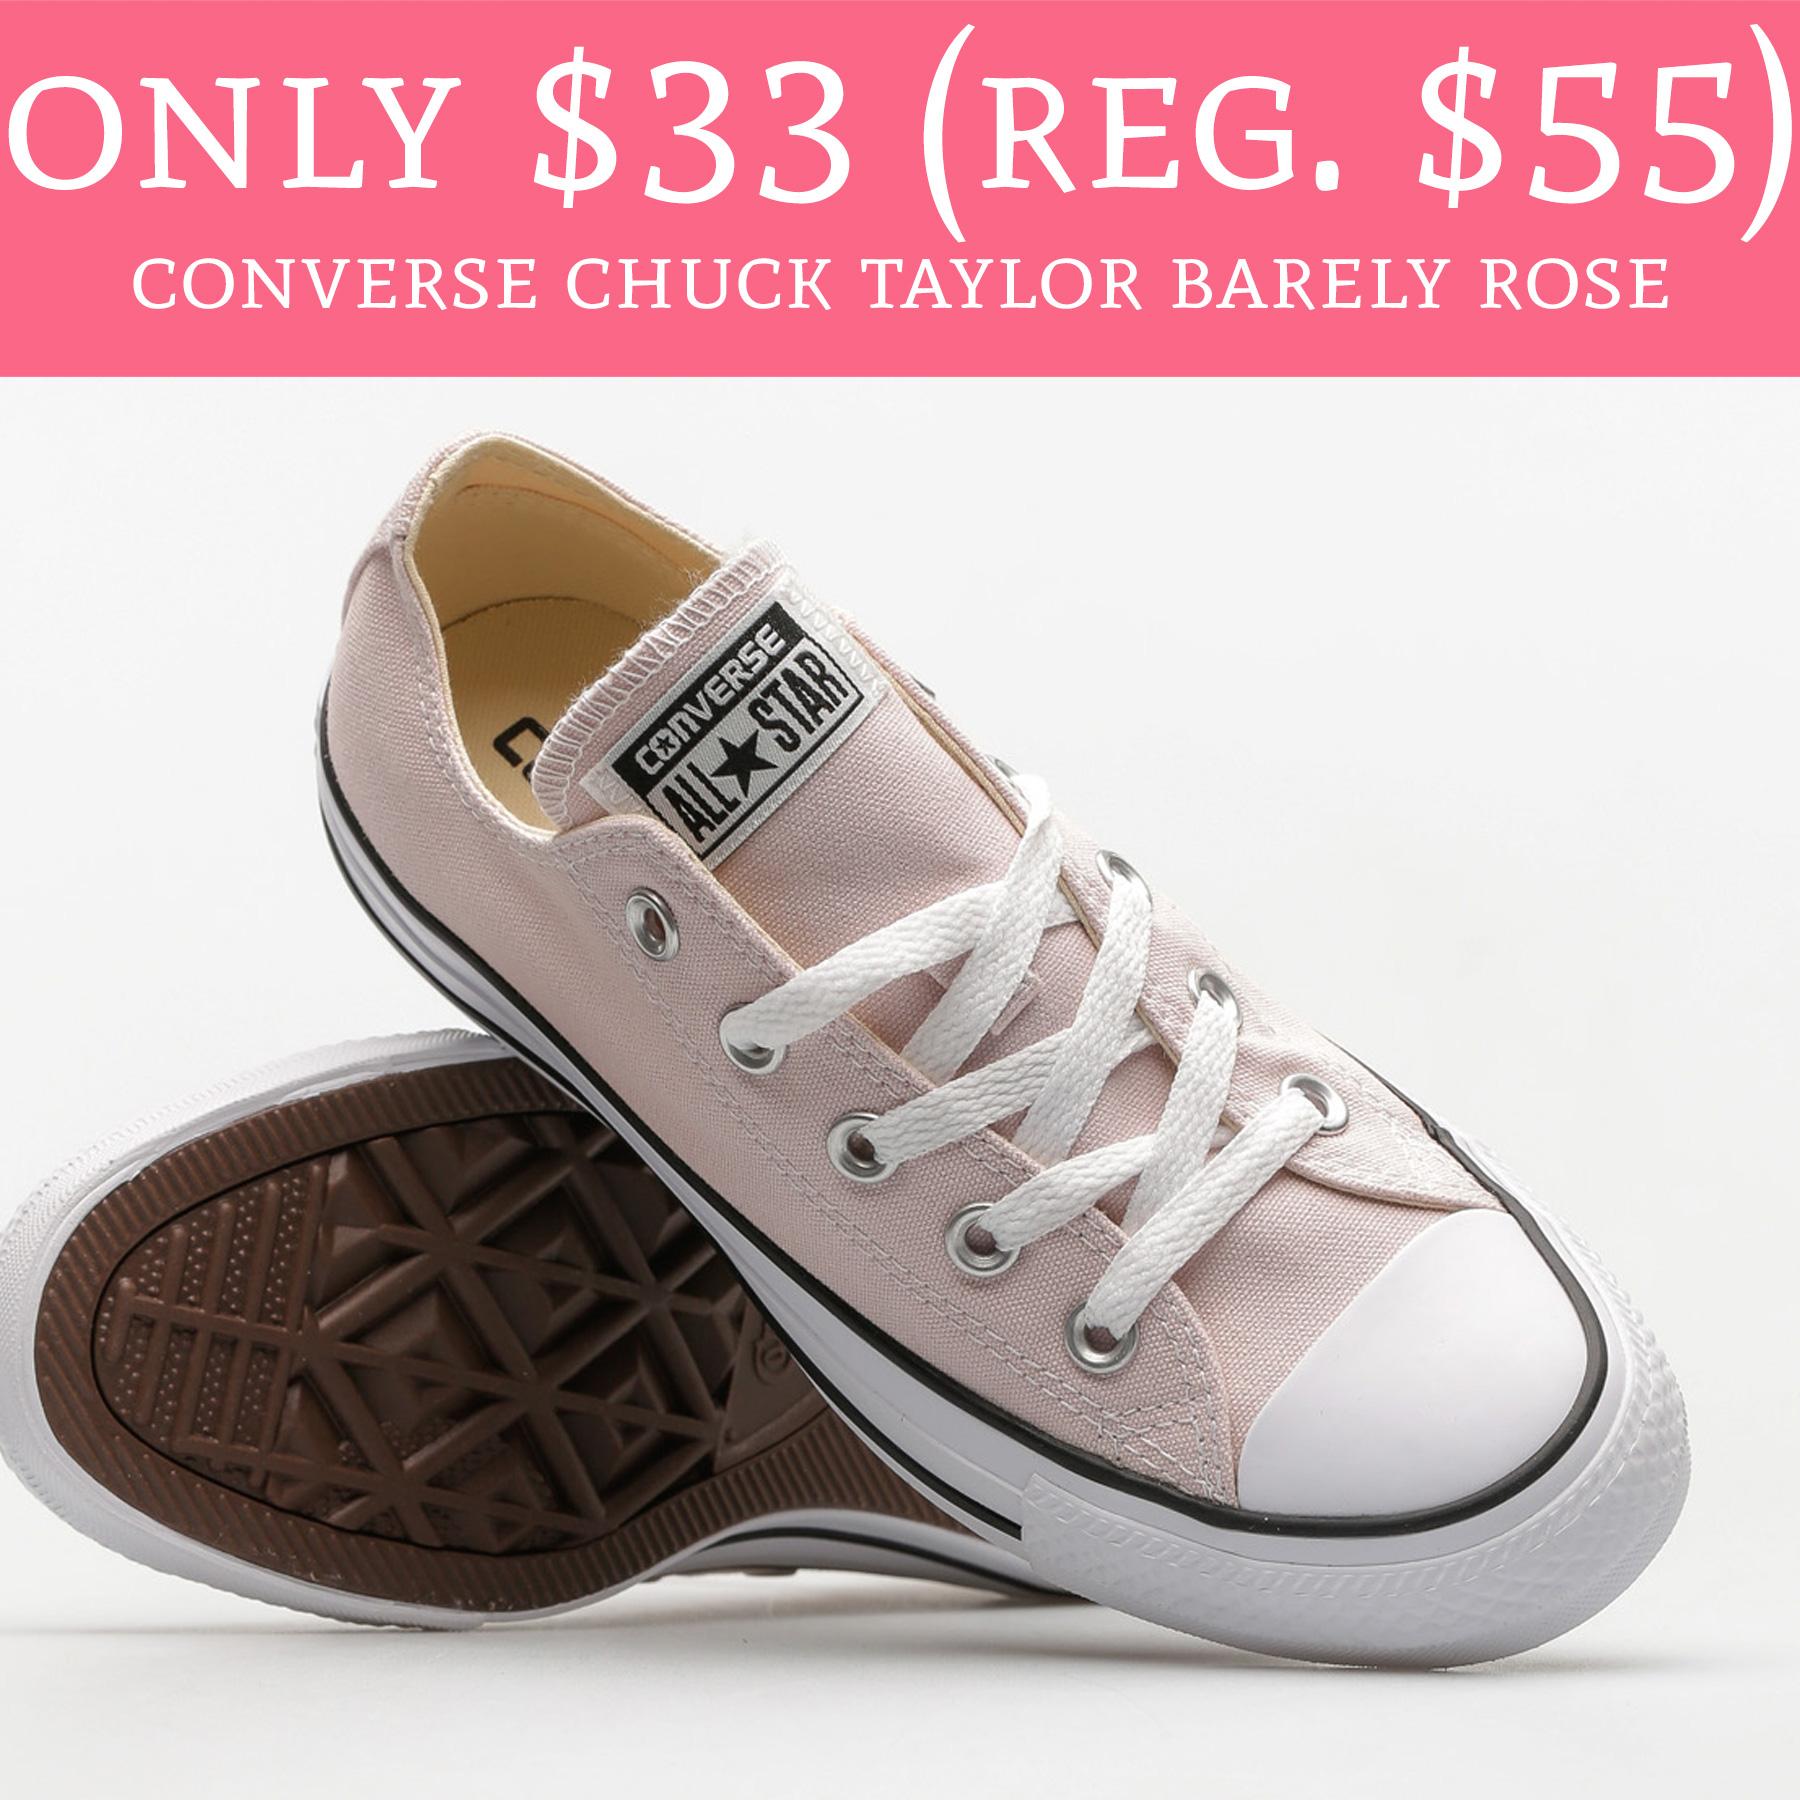 194af0316e2c44 RUN!  33 (Regular  55) Converse Chuck Taylor Barely Rose Sneakers ...